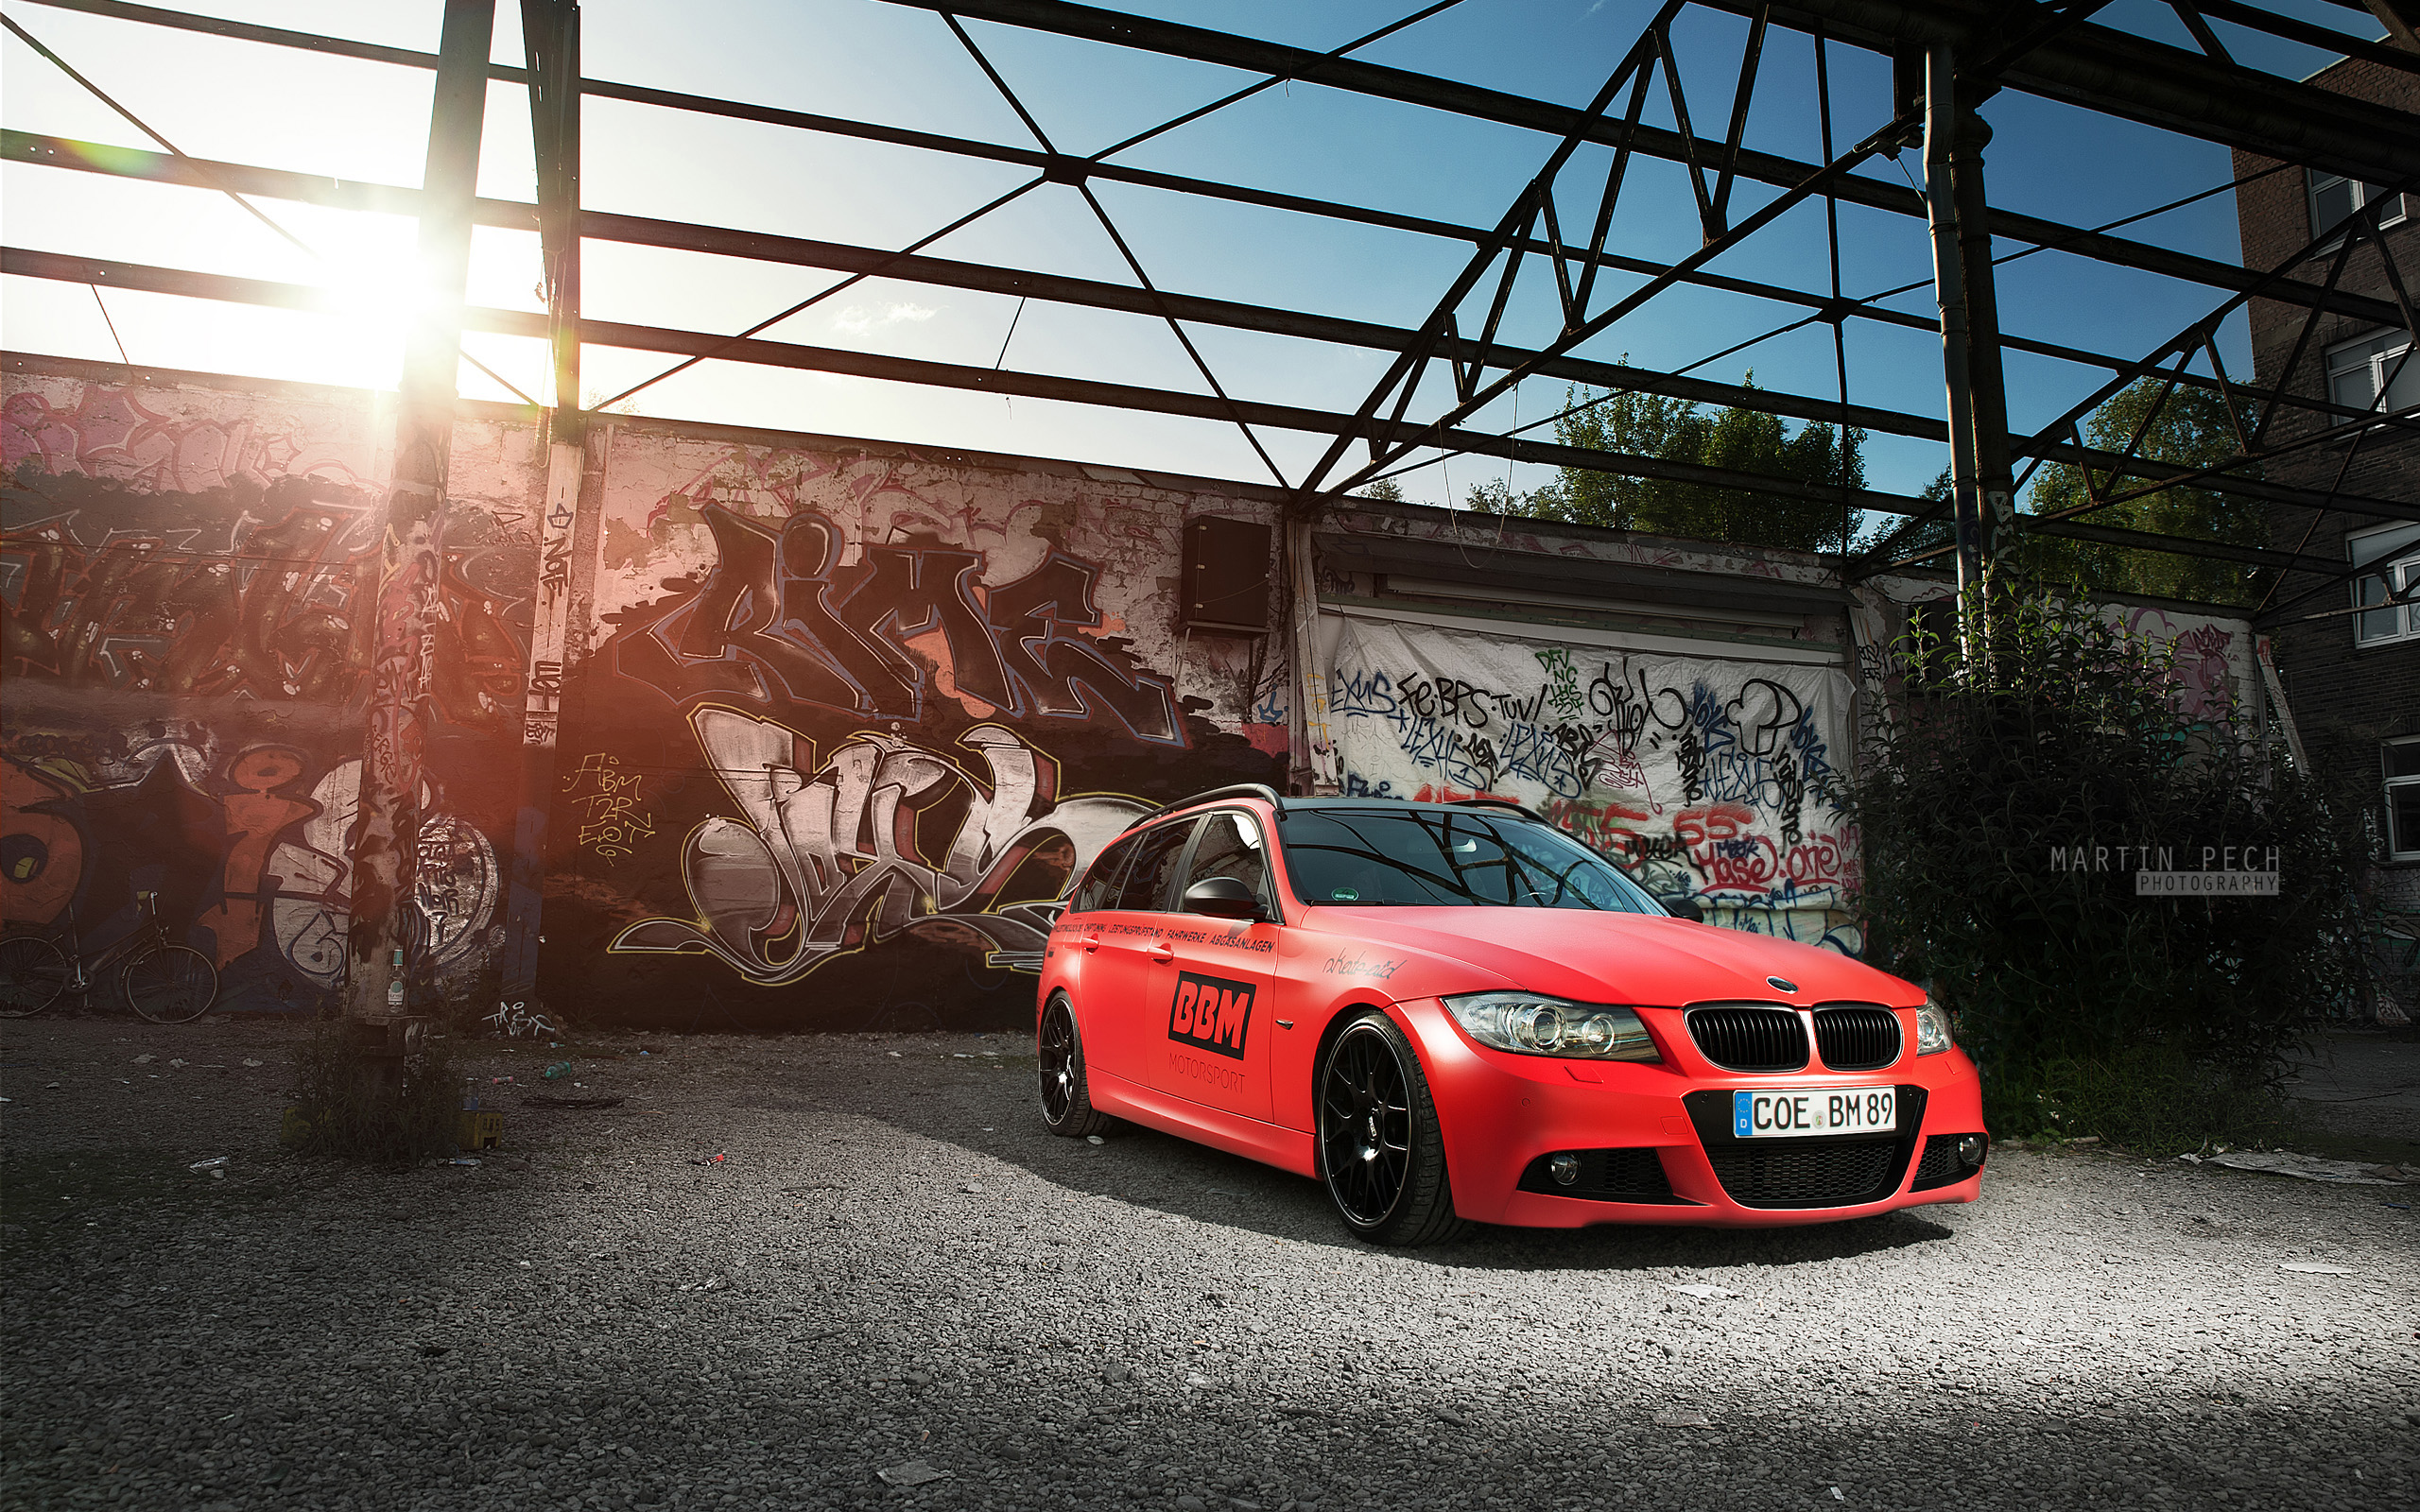 2013 Bmw E91 330d By Bbm Motorsport Wallpaper Hd Car